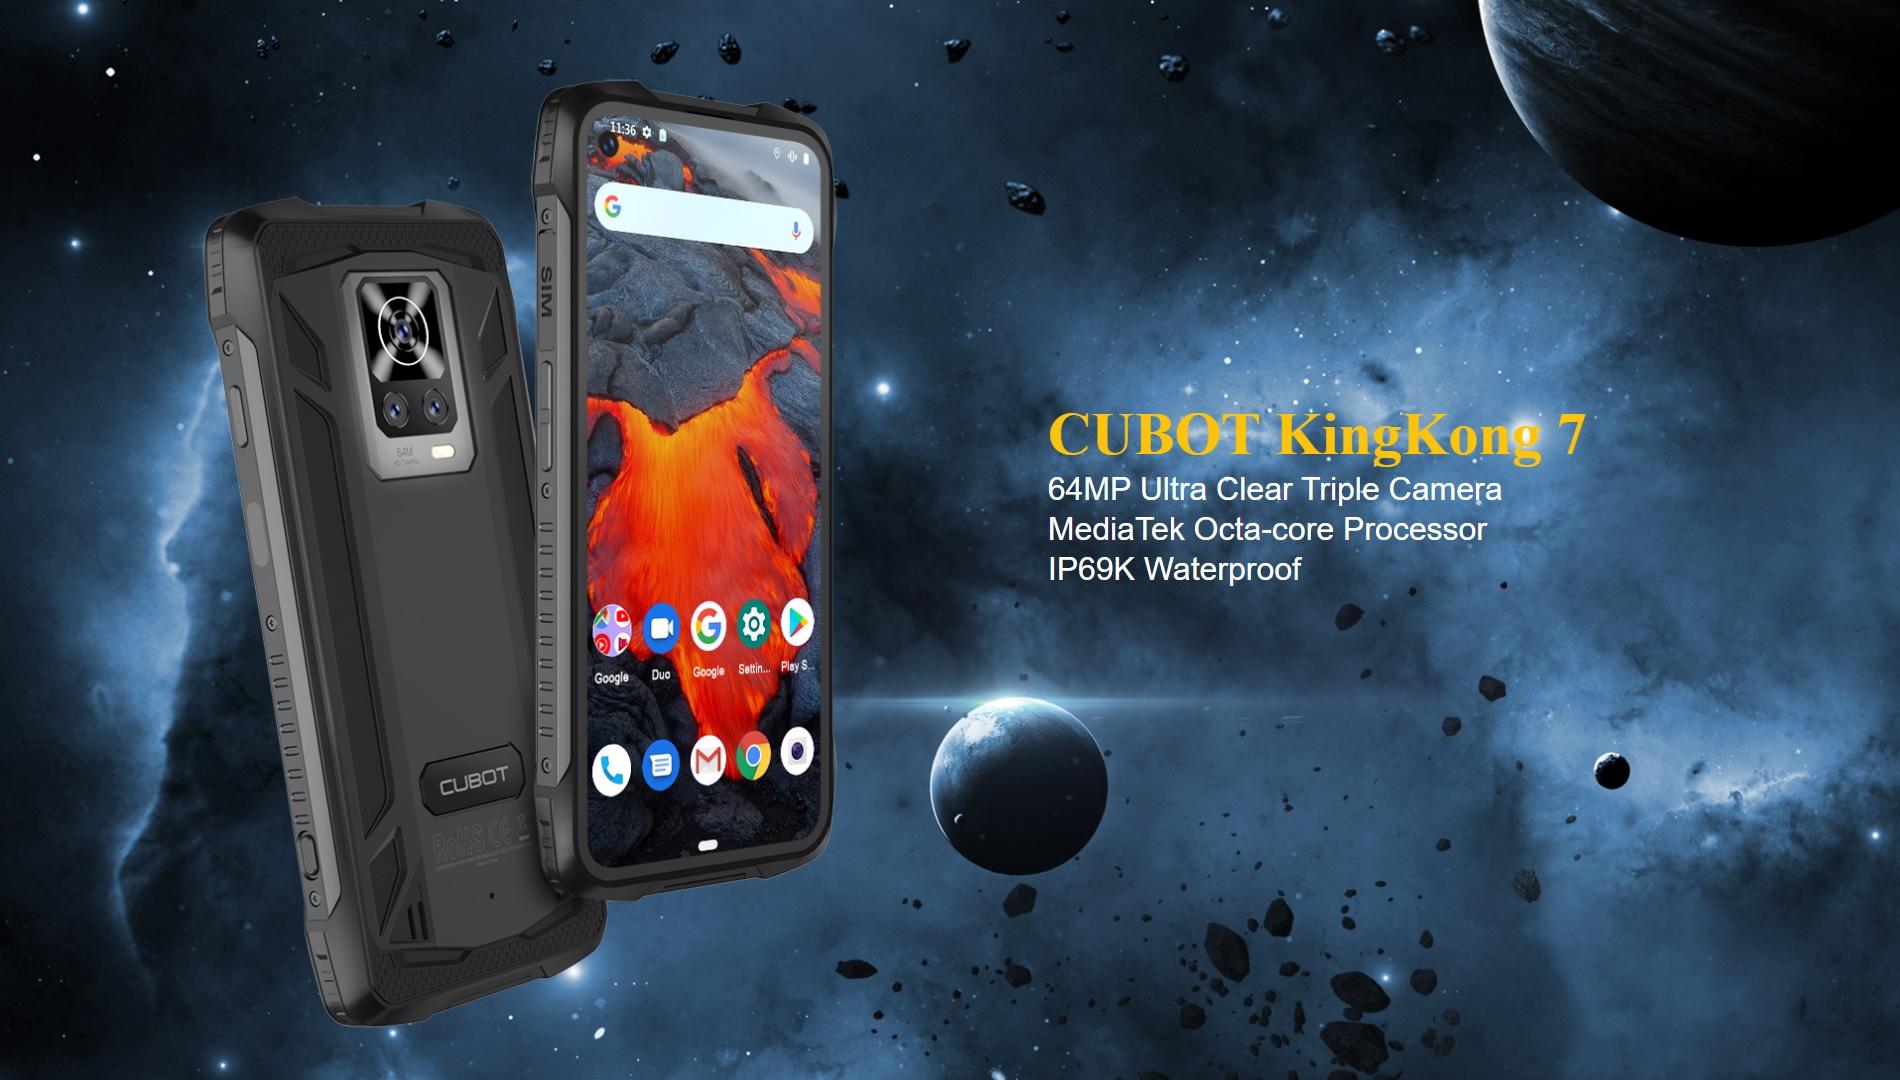 smartfon Cubot KingKong 7 smartphone